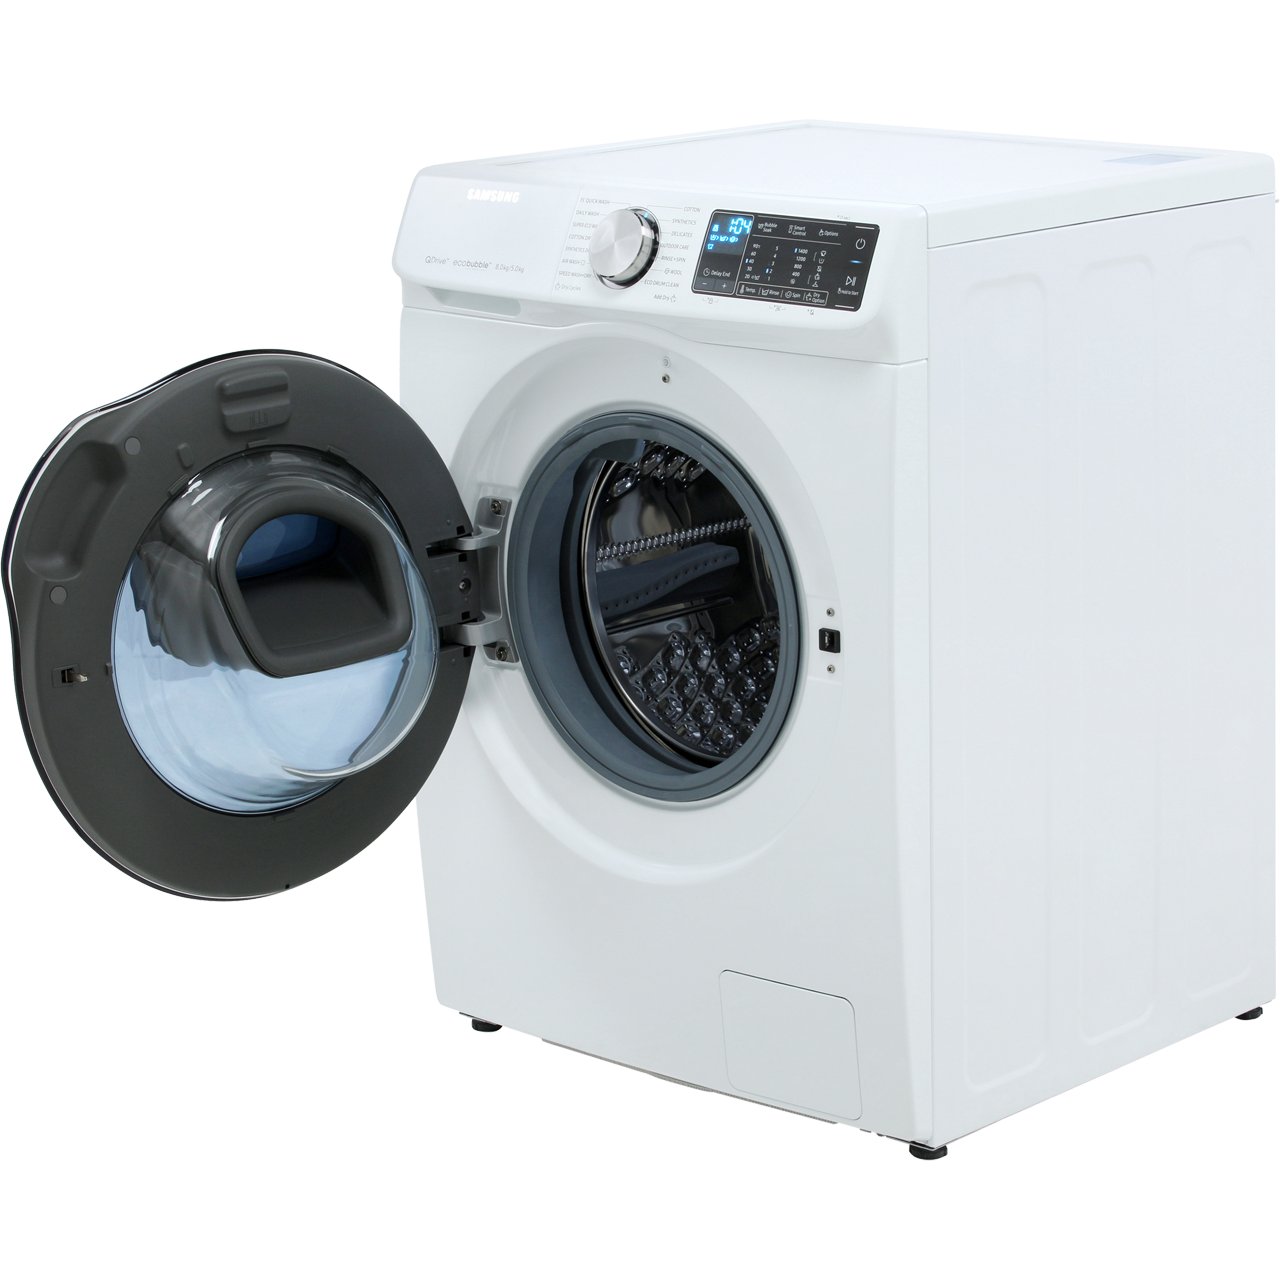 samsung quickdrive wd80n645oow washer dryer white. Black Bedroom Furniture Sets. Home Design Ideas